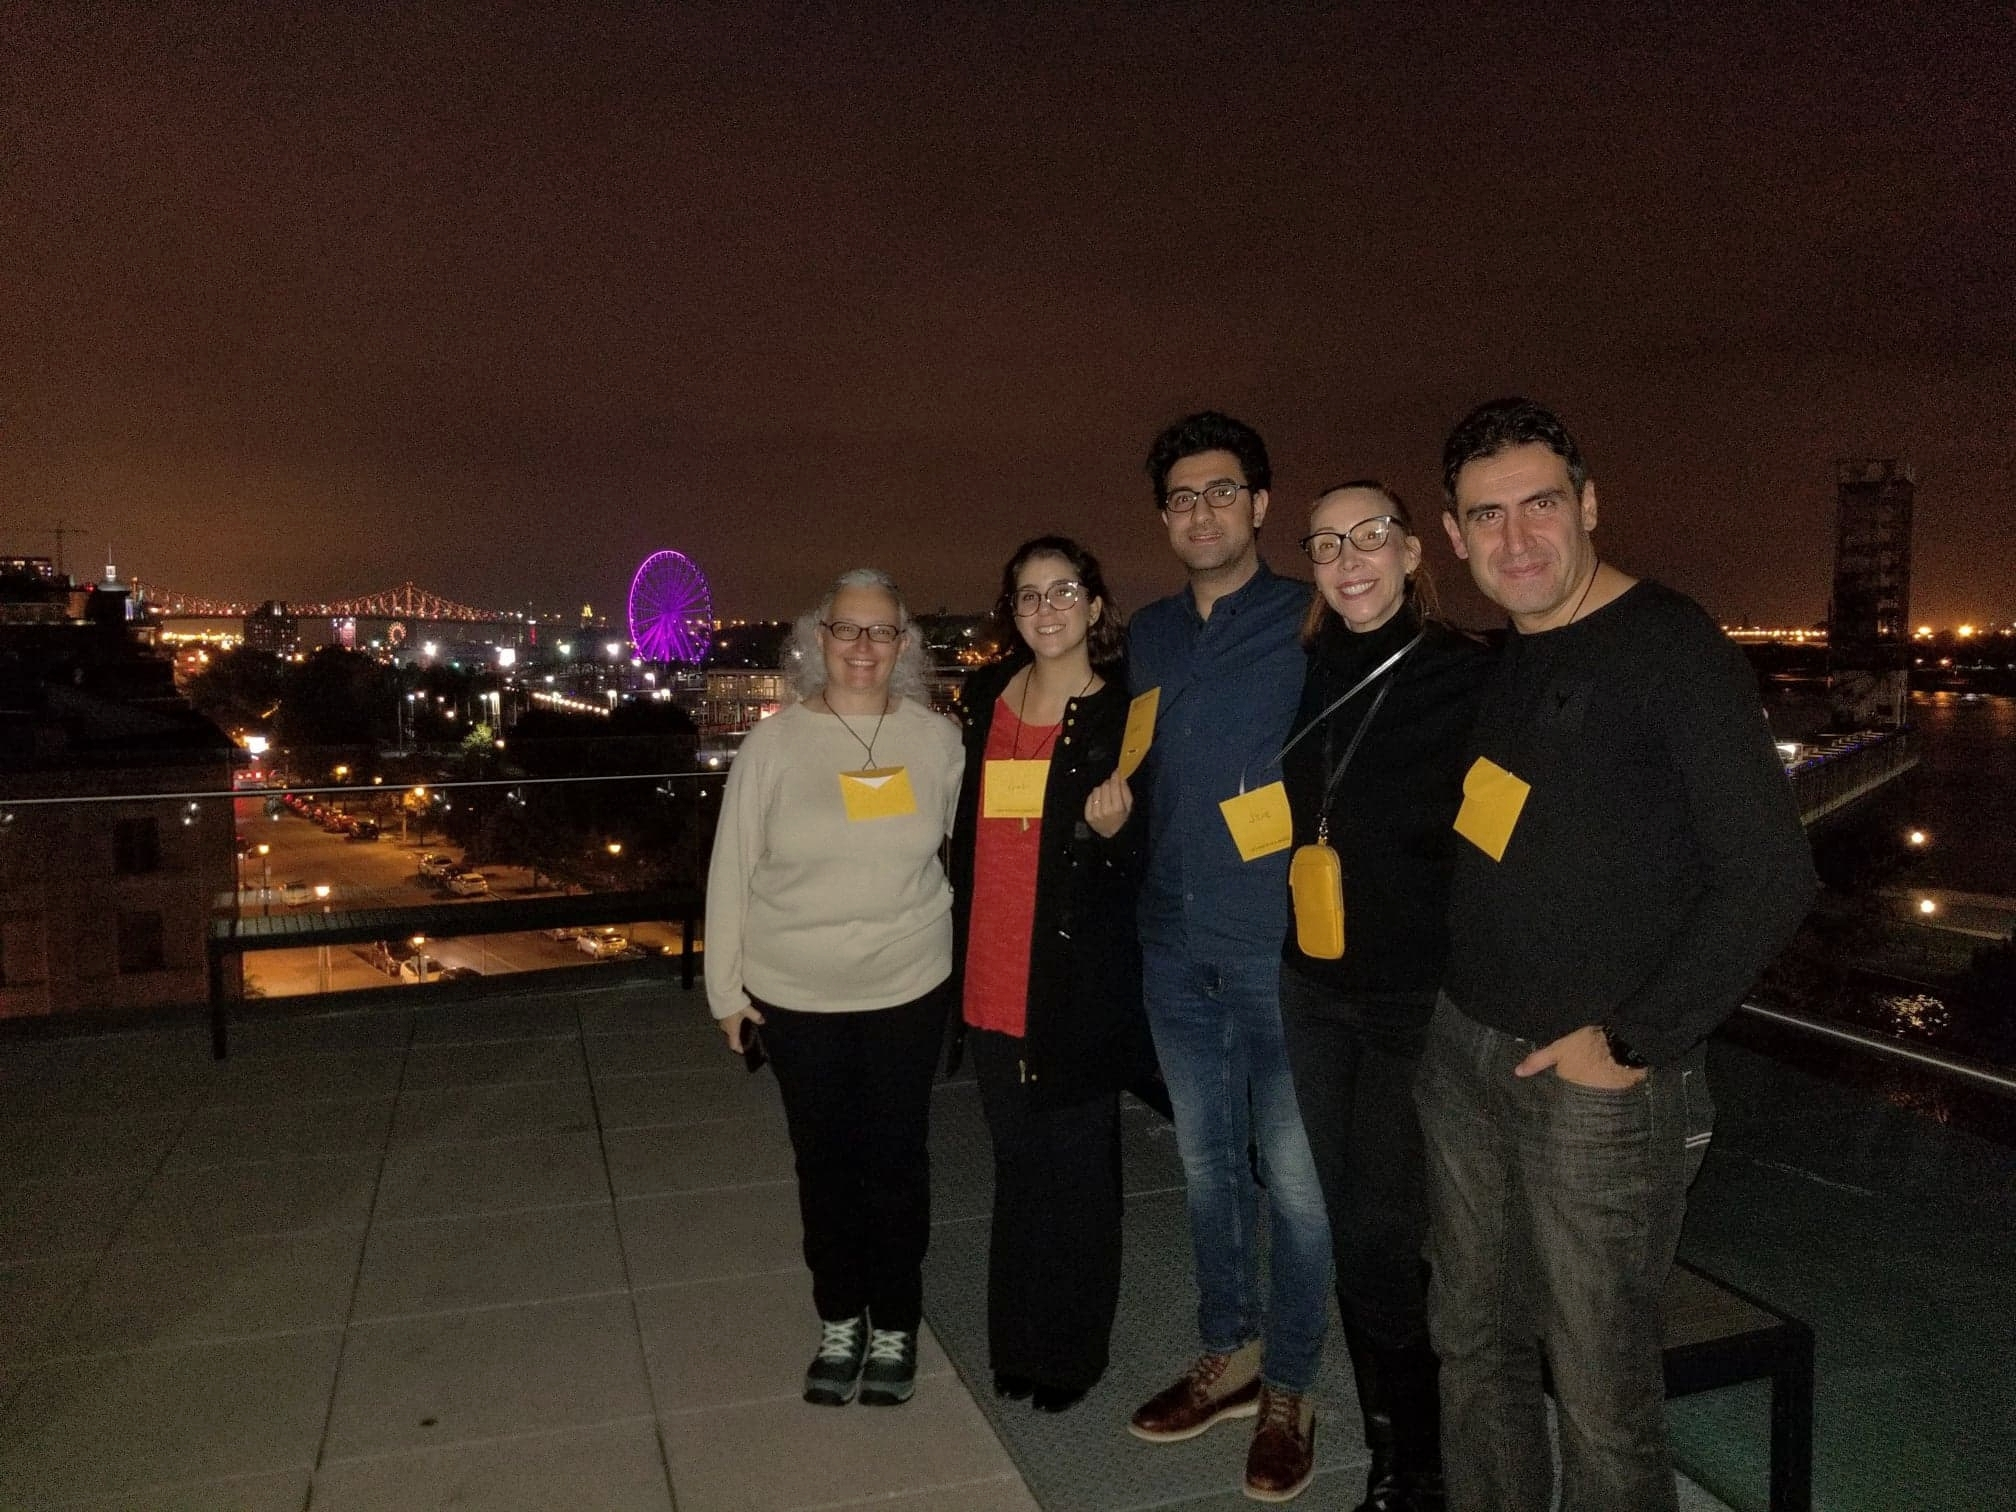 Cintia Blanco, Gabi , Ahmad Maaref et Abe